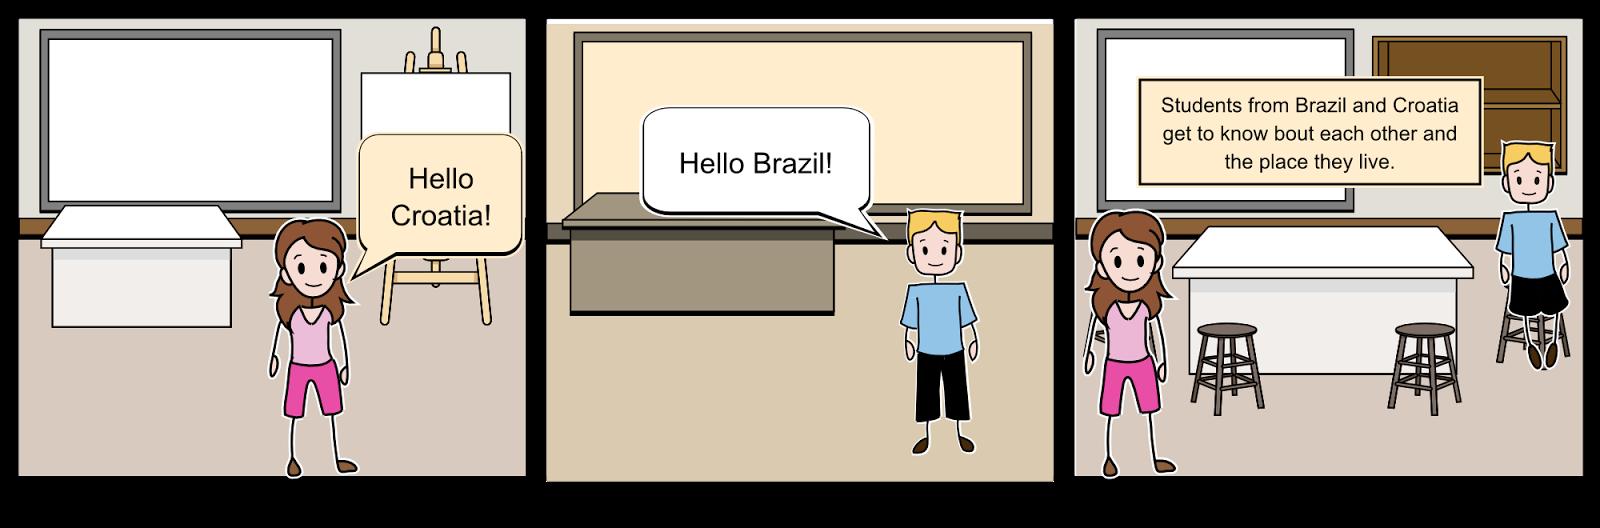 hello--brazil--hello--croatia-.png